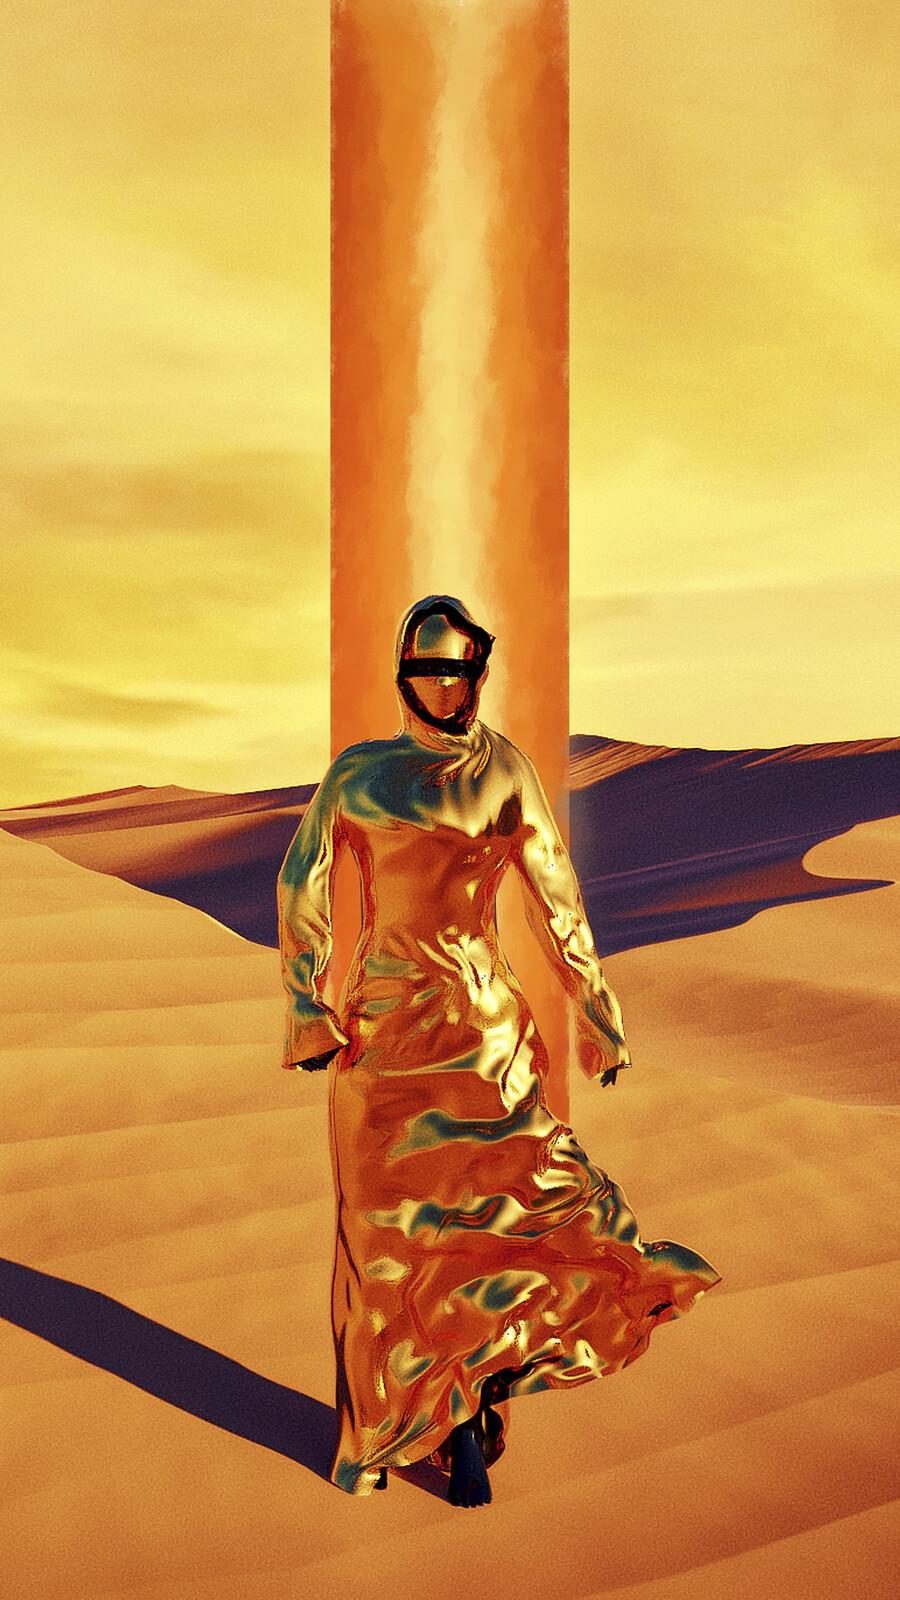 Title: Journey  Description: A Bedouin woman in a Golden abaya Walks through the Dunes